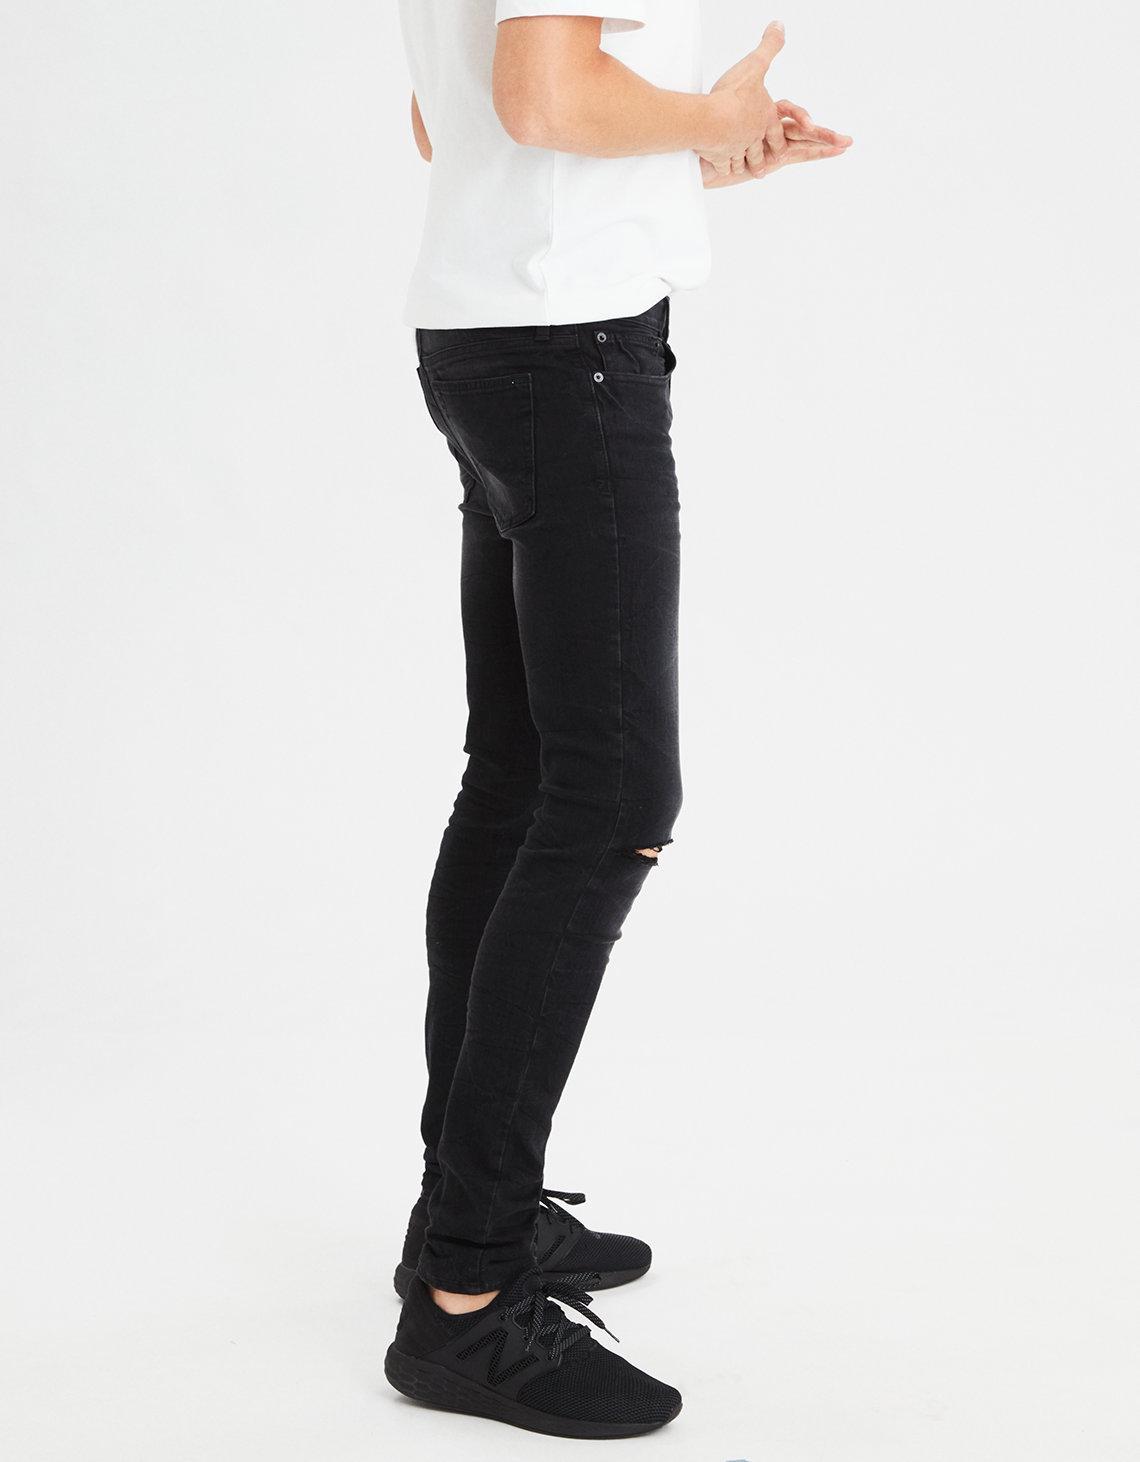 Lyst - American Eagle Ae 360 Extreme Flex Super Skinny Jean in Black for Men 1c2117108